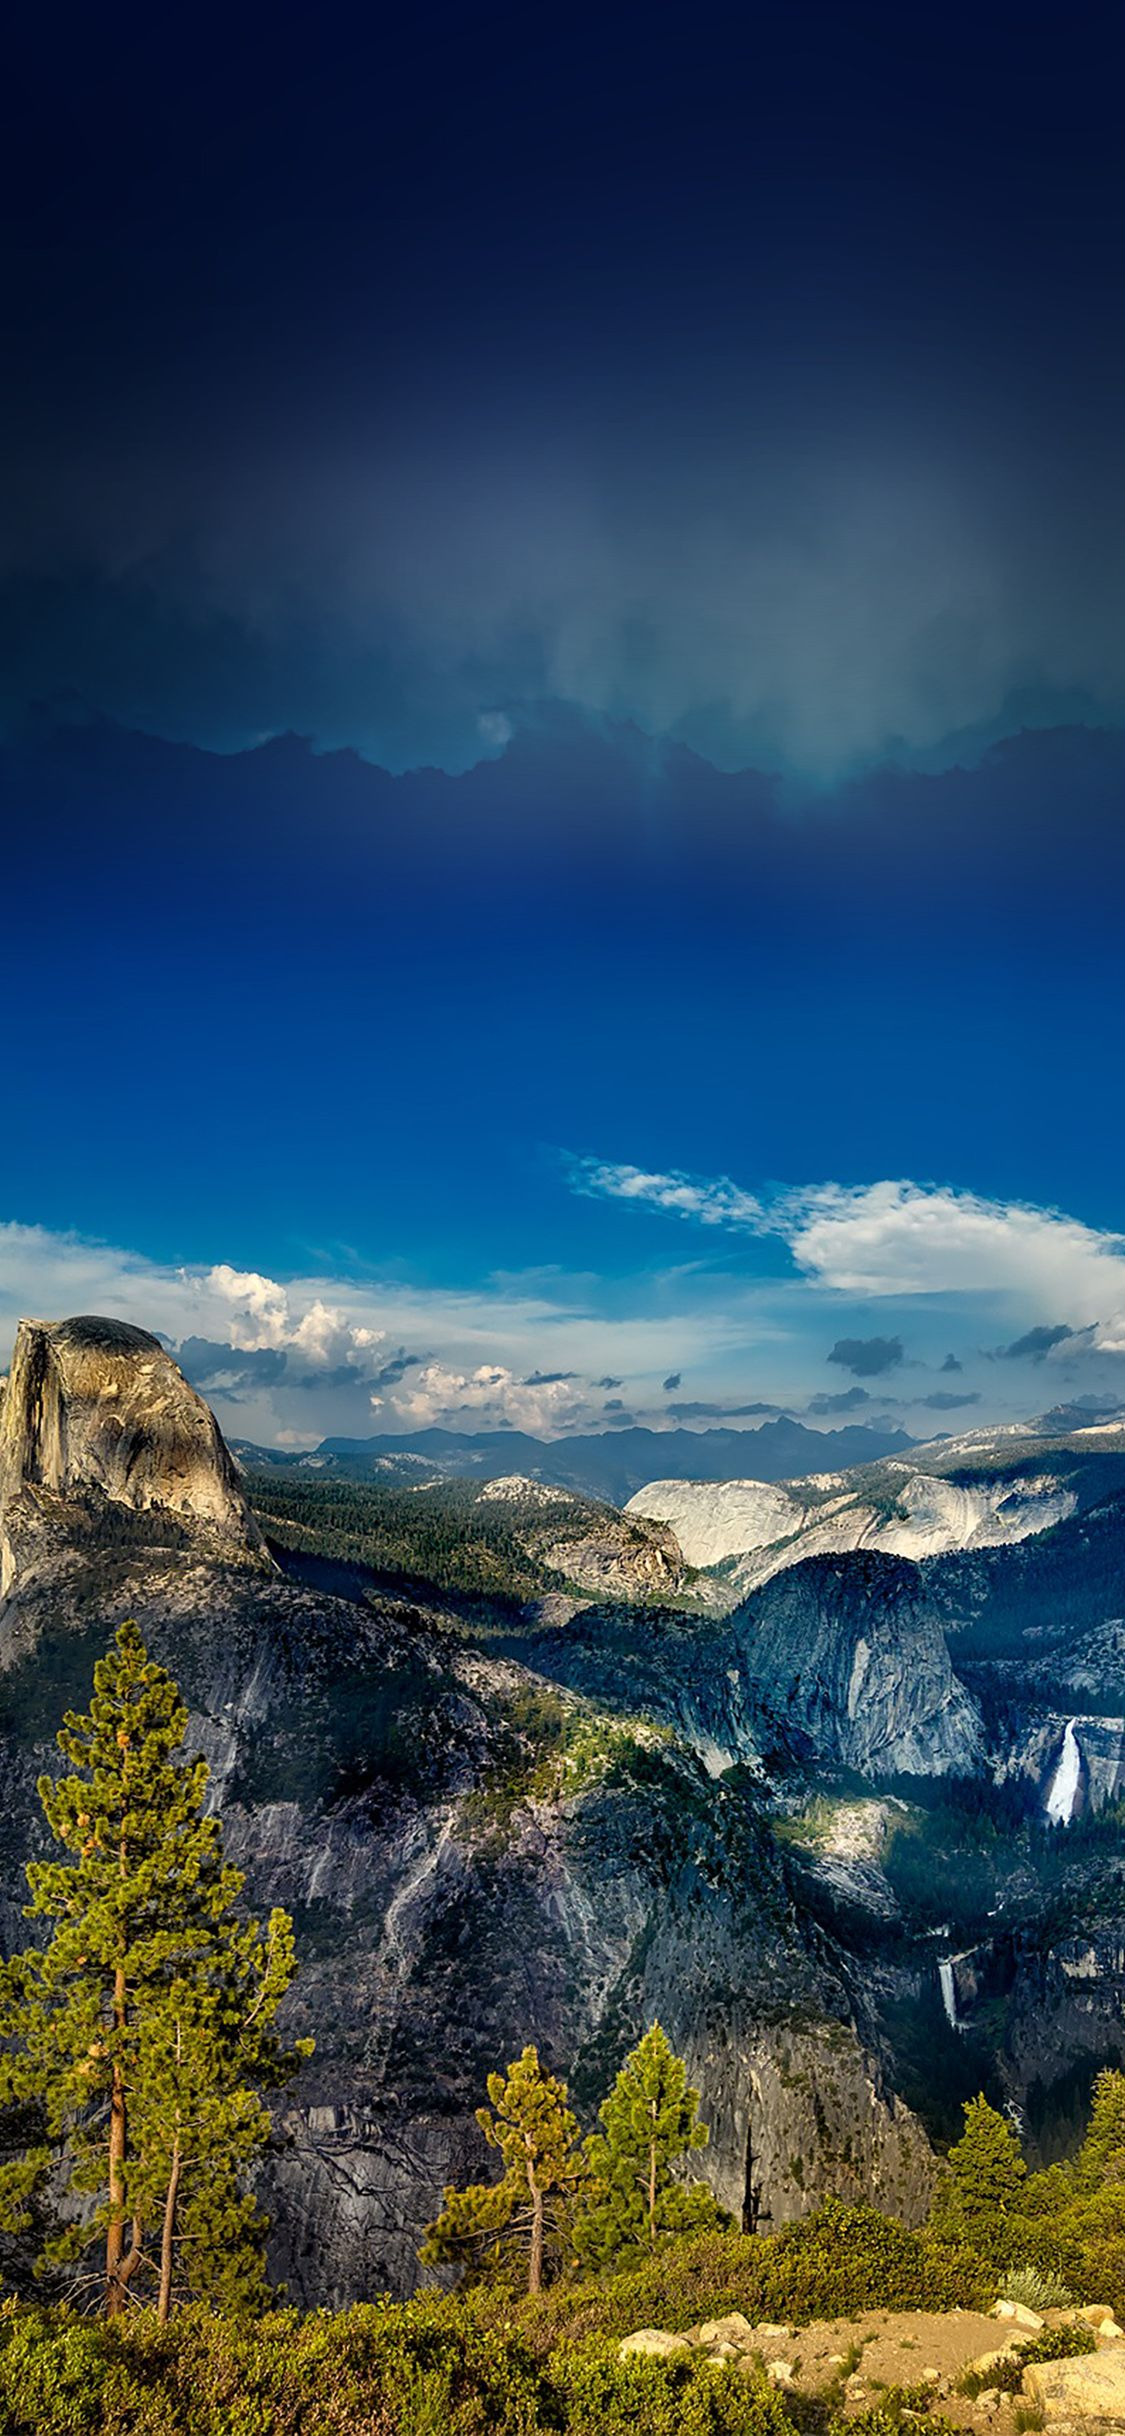 Iphone X Wallpaper Nq61 Yosemite Mountain Wood Summer Nature